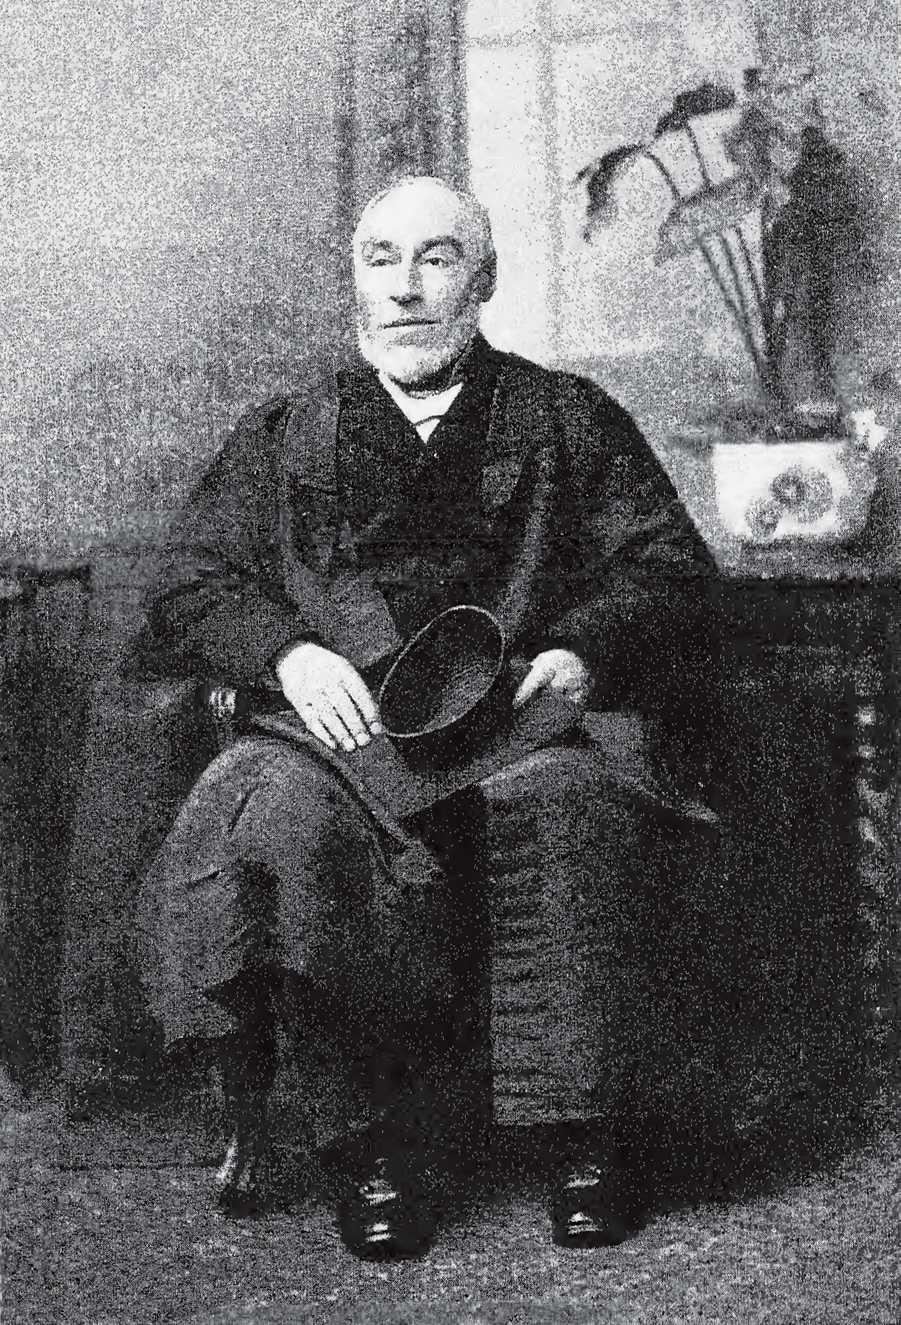 Rev James Leigh Joynes - Lower Master of Eton 1878-1887